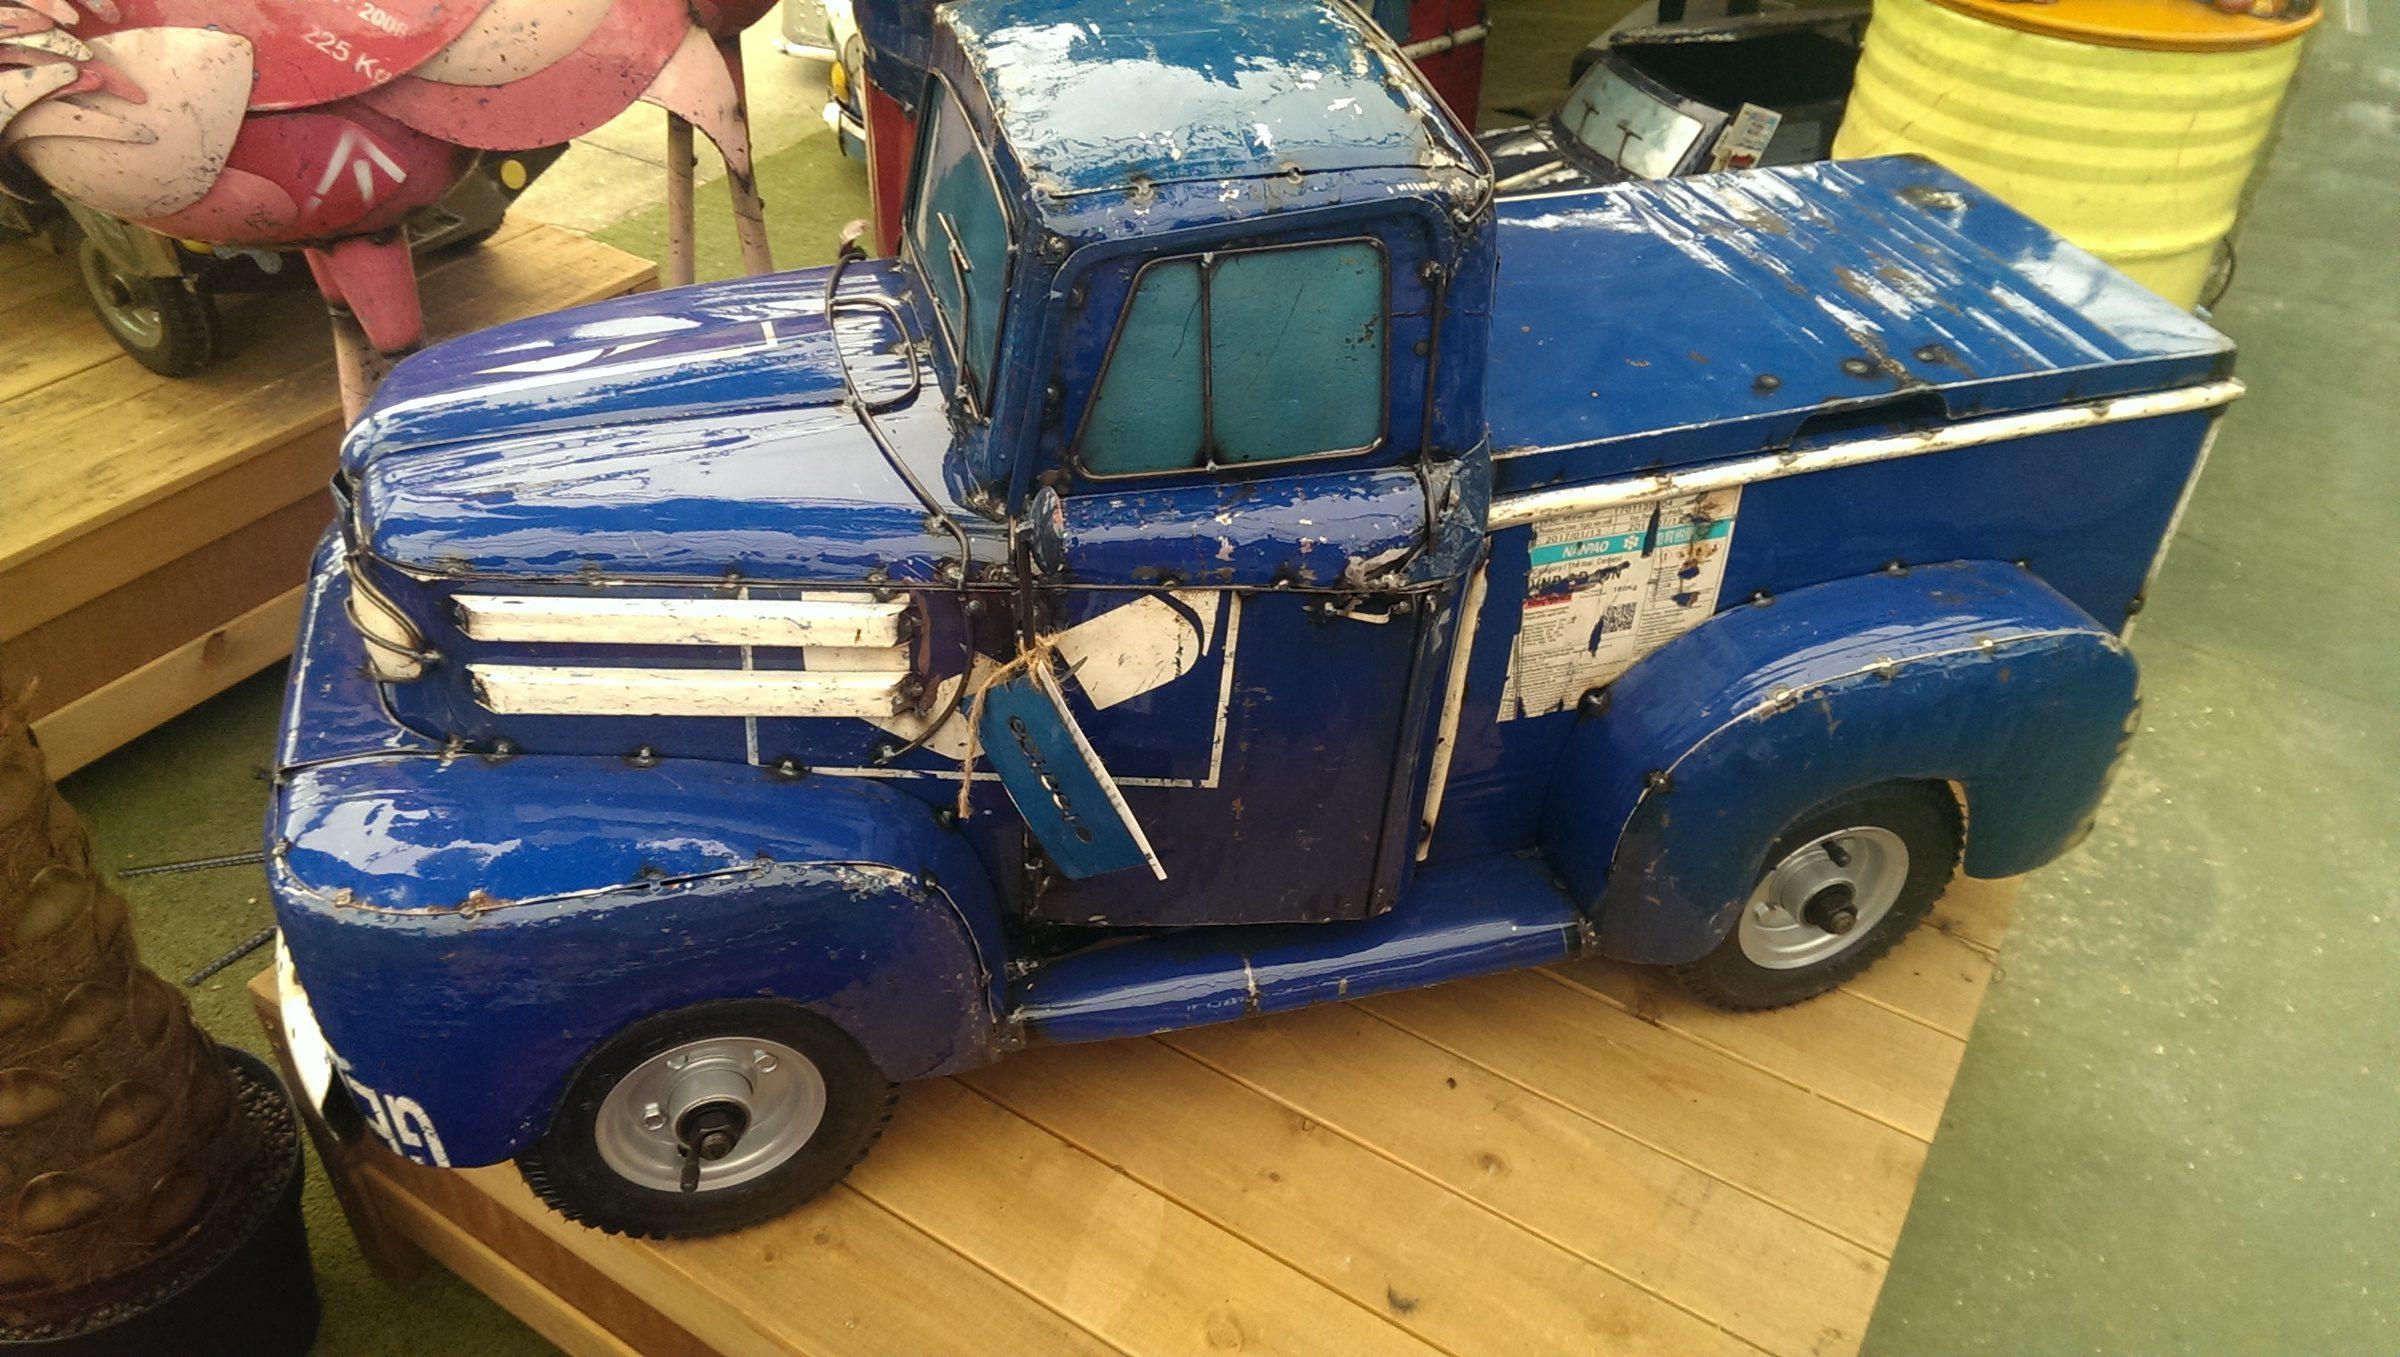 1950s Pick-up Truck Ice-Box - Blue